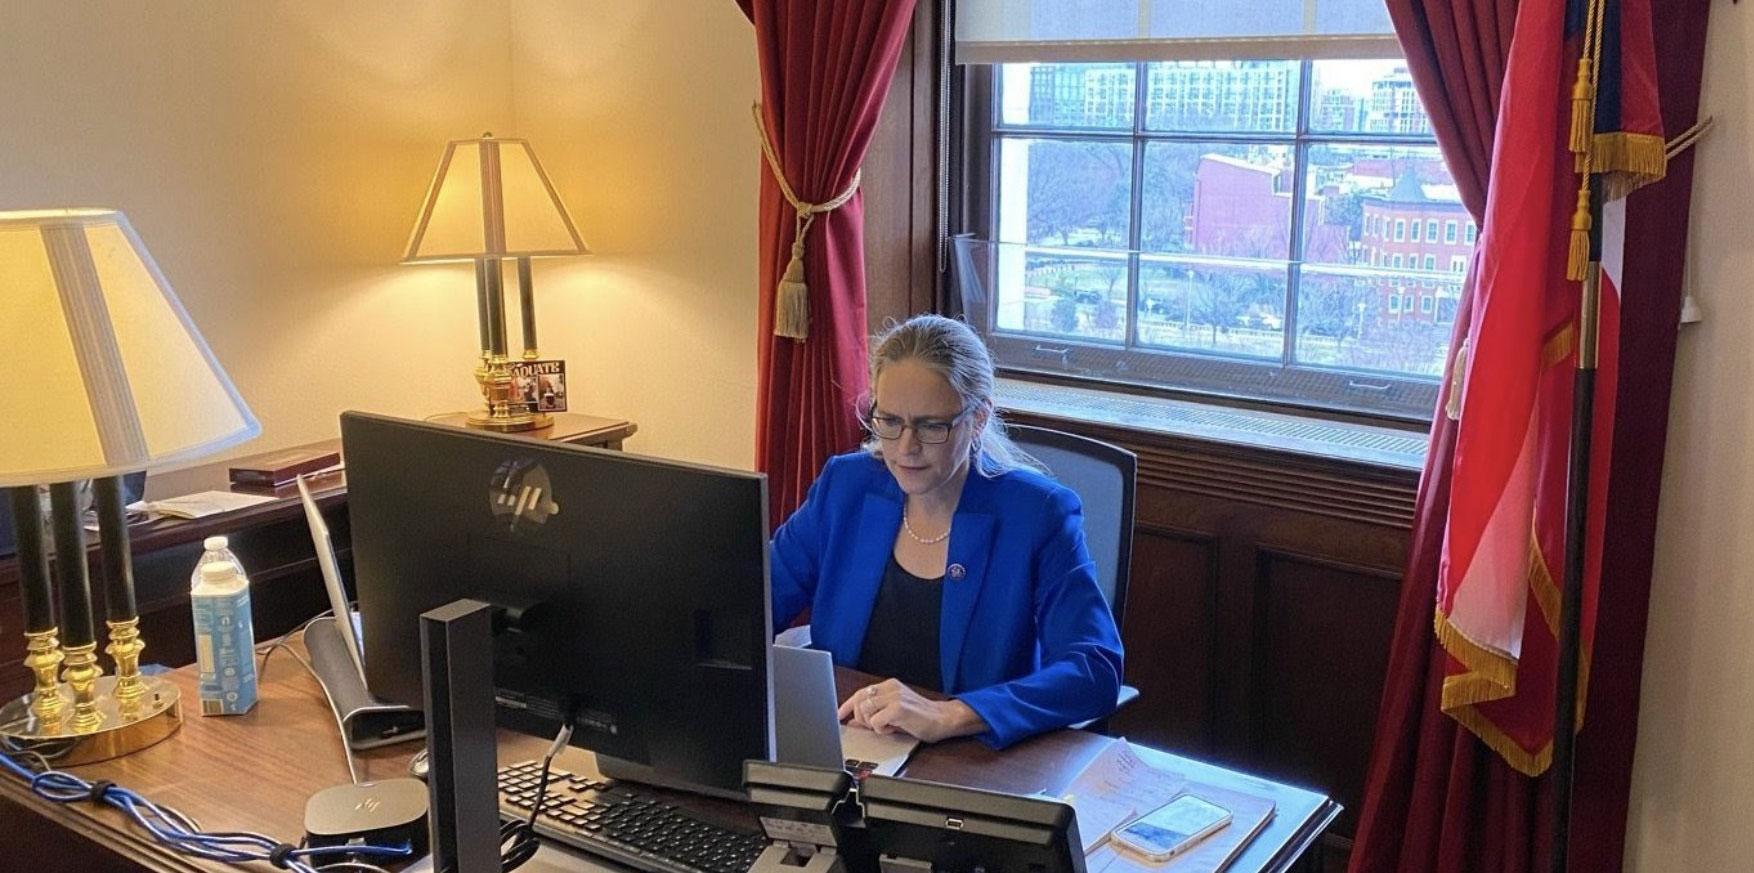 Carolyn Bourdeaux at her desk in her office